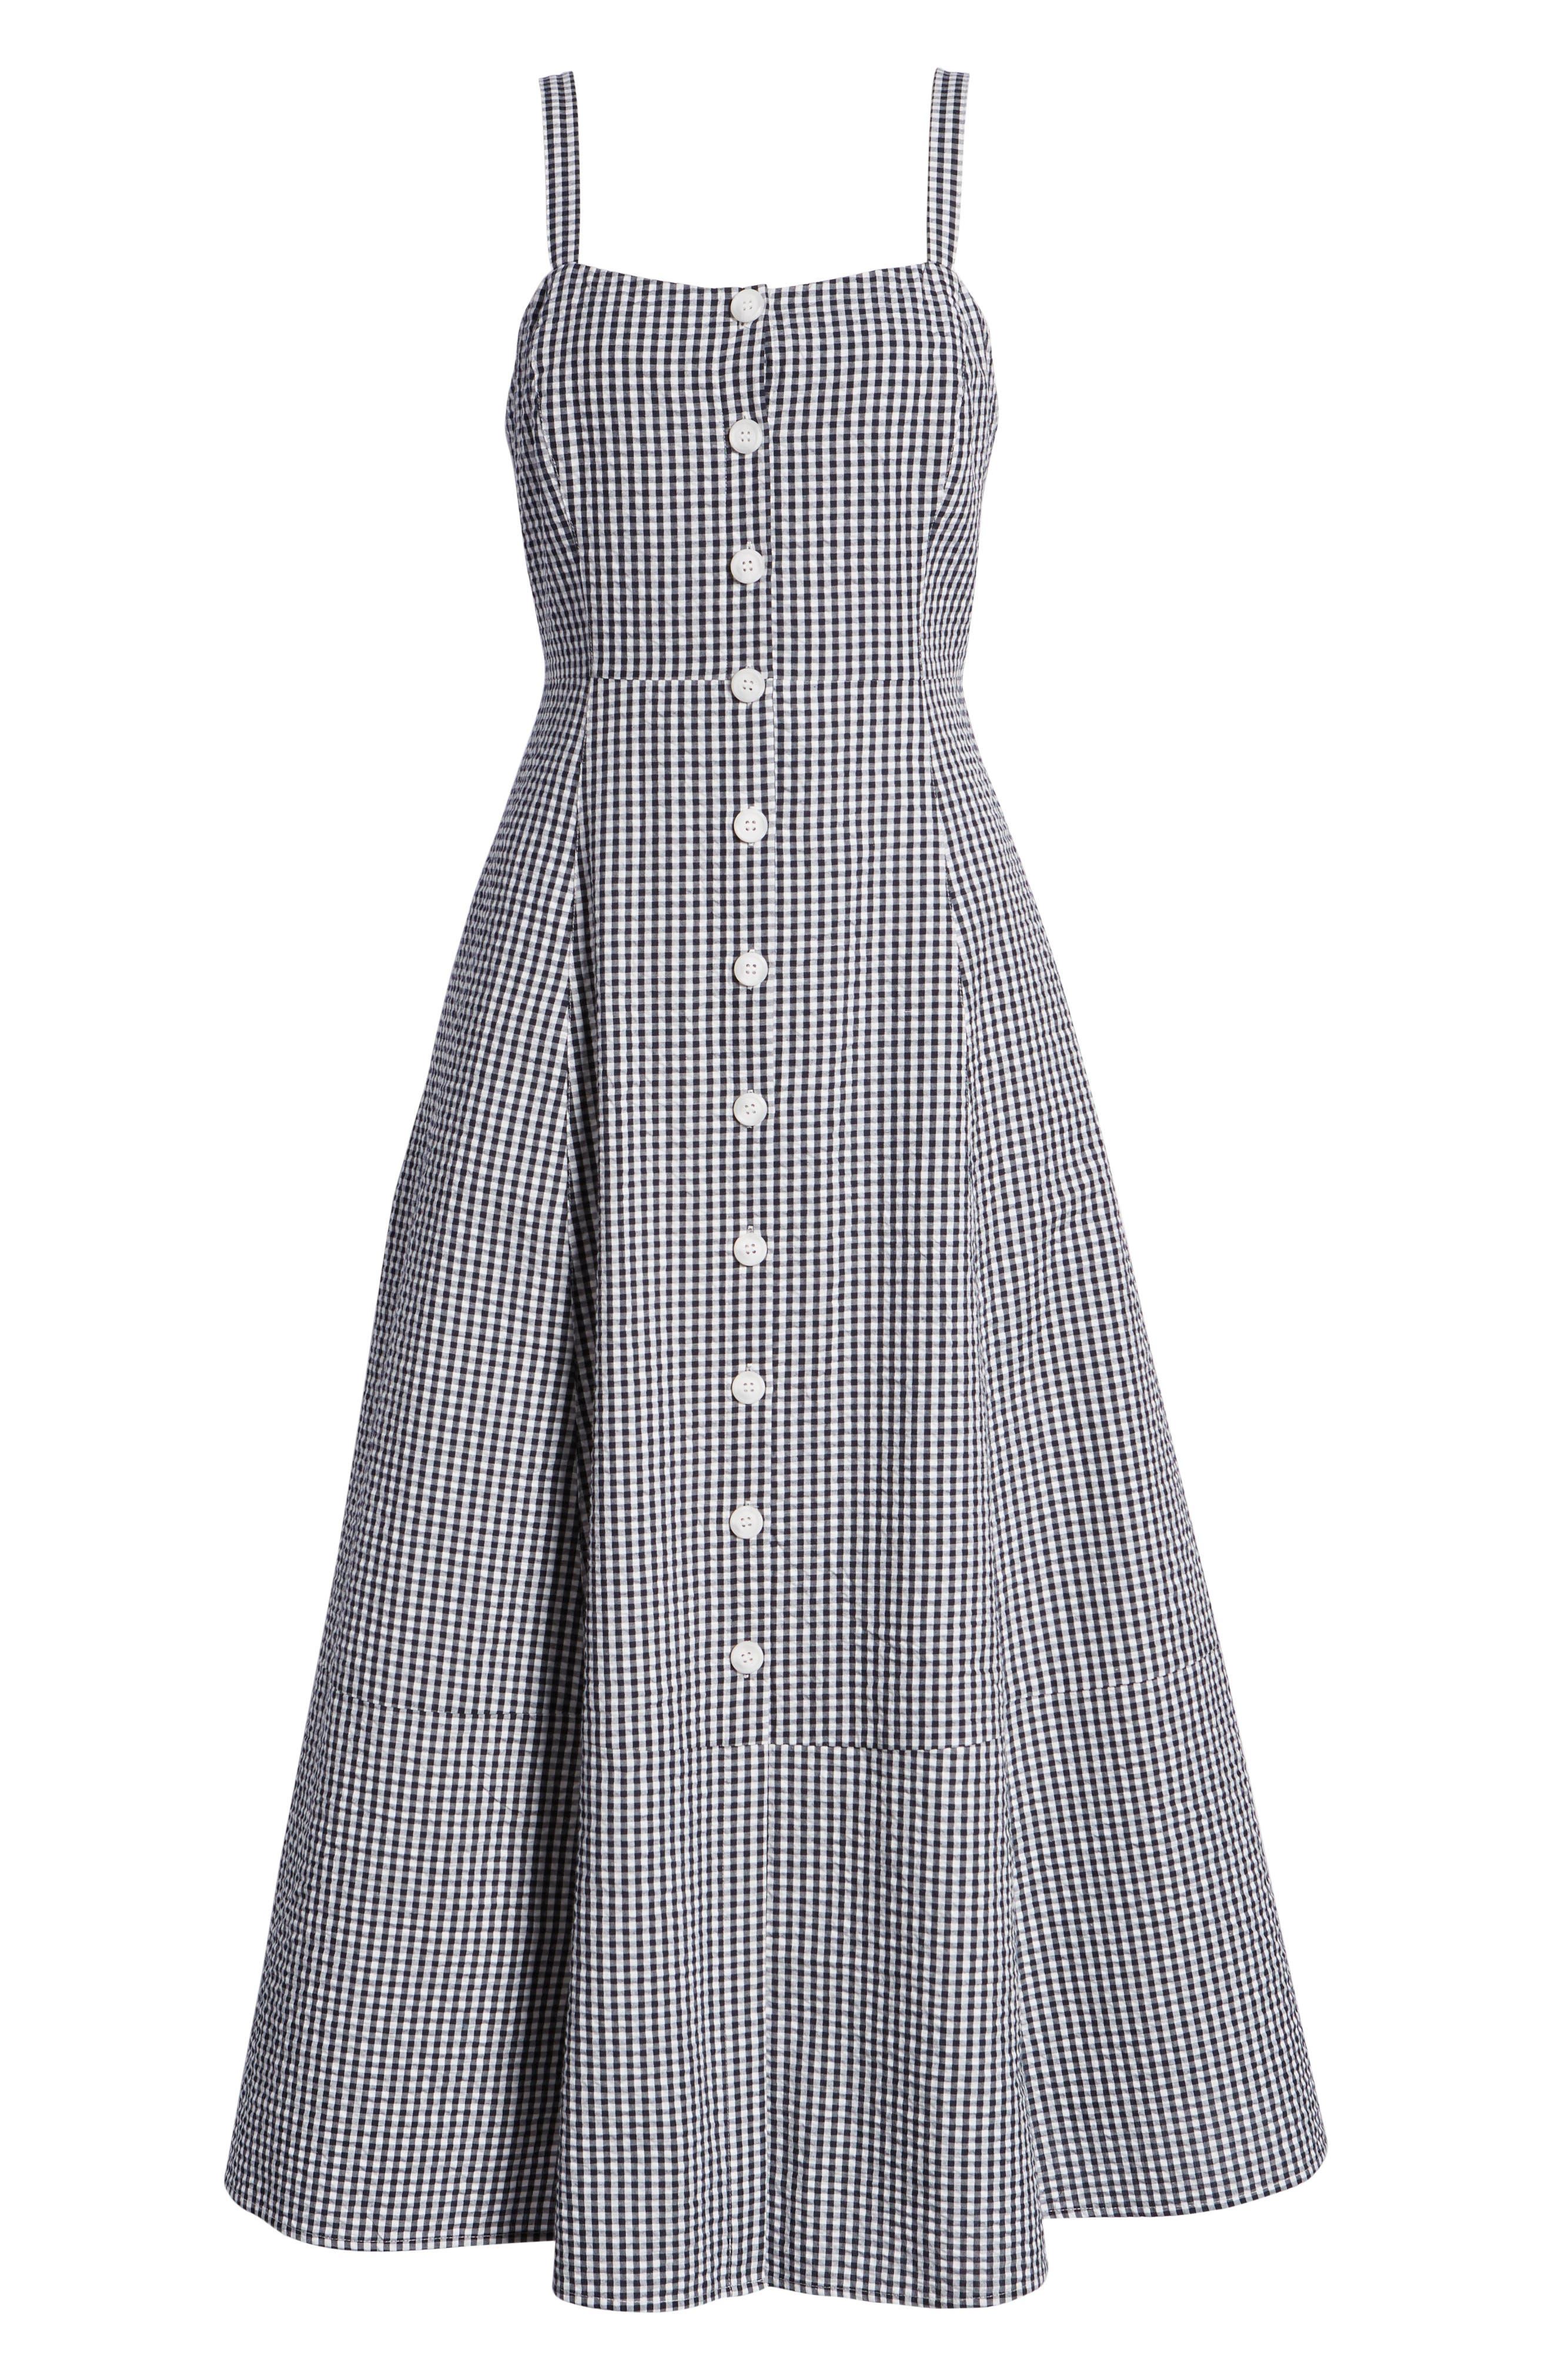 Gingham Button Front Cotton Blend Dress,                             Alternate thumbnail 7, color,                             Navy- White Gingham